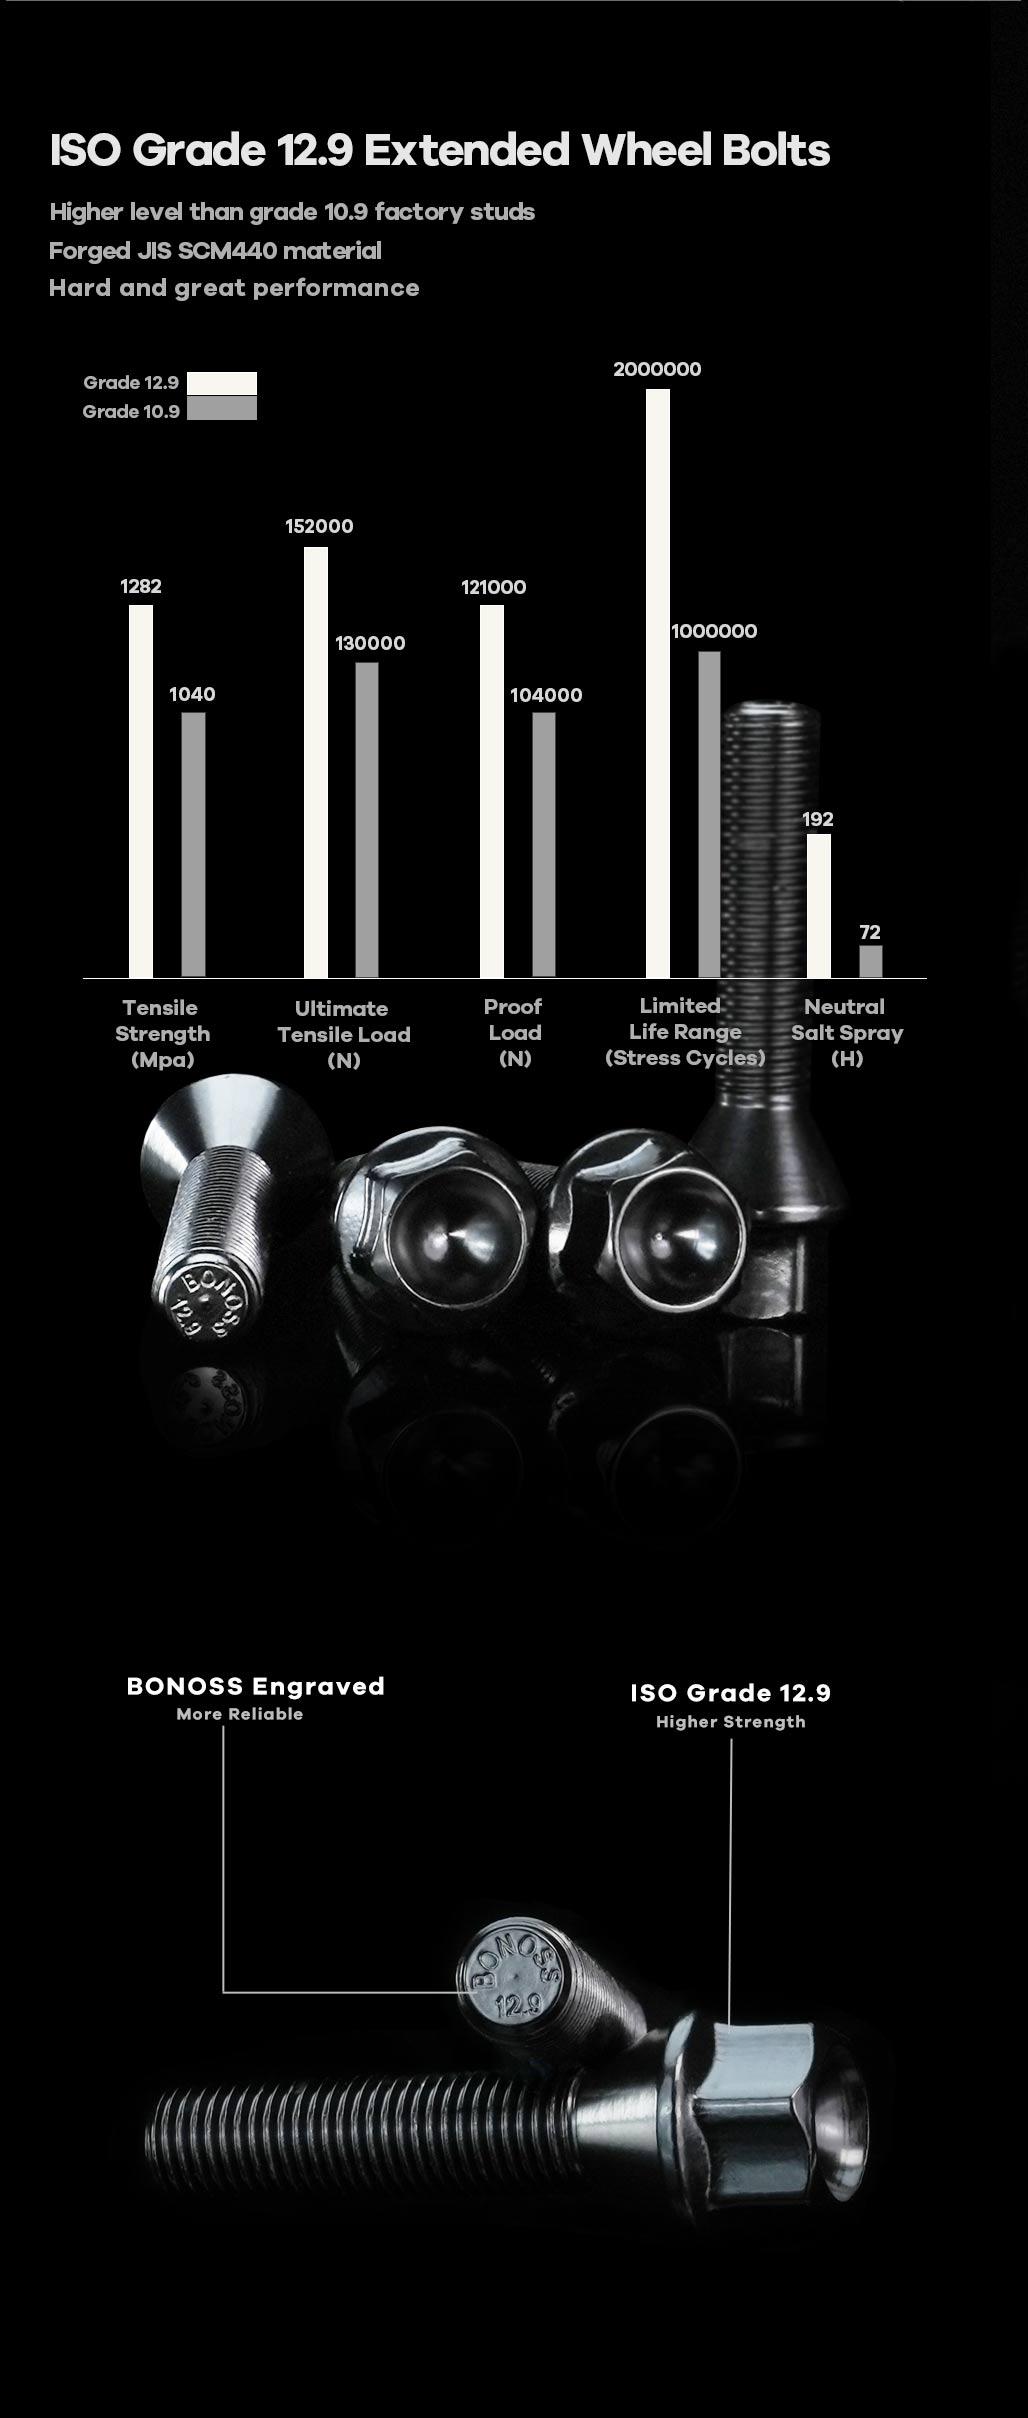 BONOSS-forged-lightweight-plus-wheel-spacers-by-lulu-4